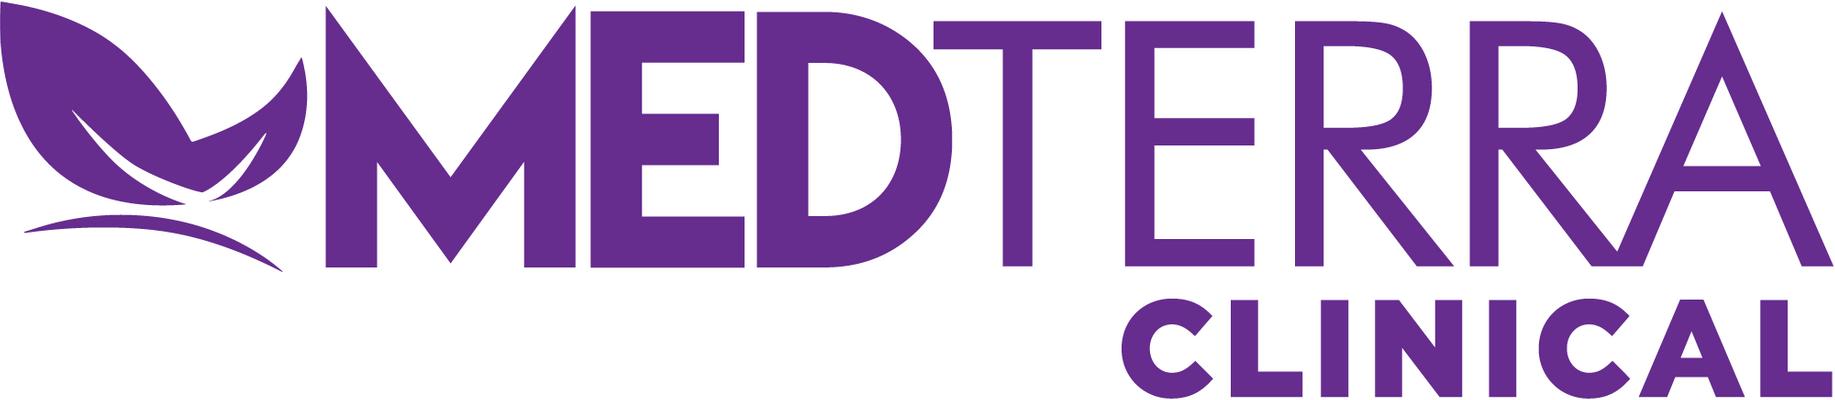 Medterra logo.png